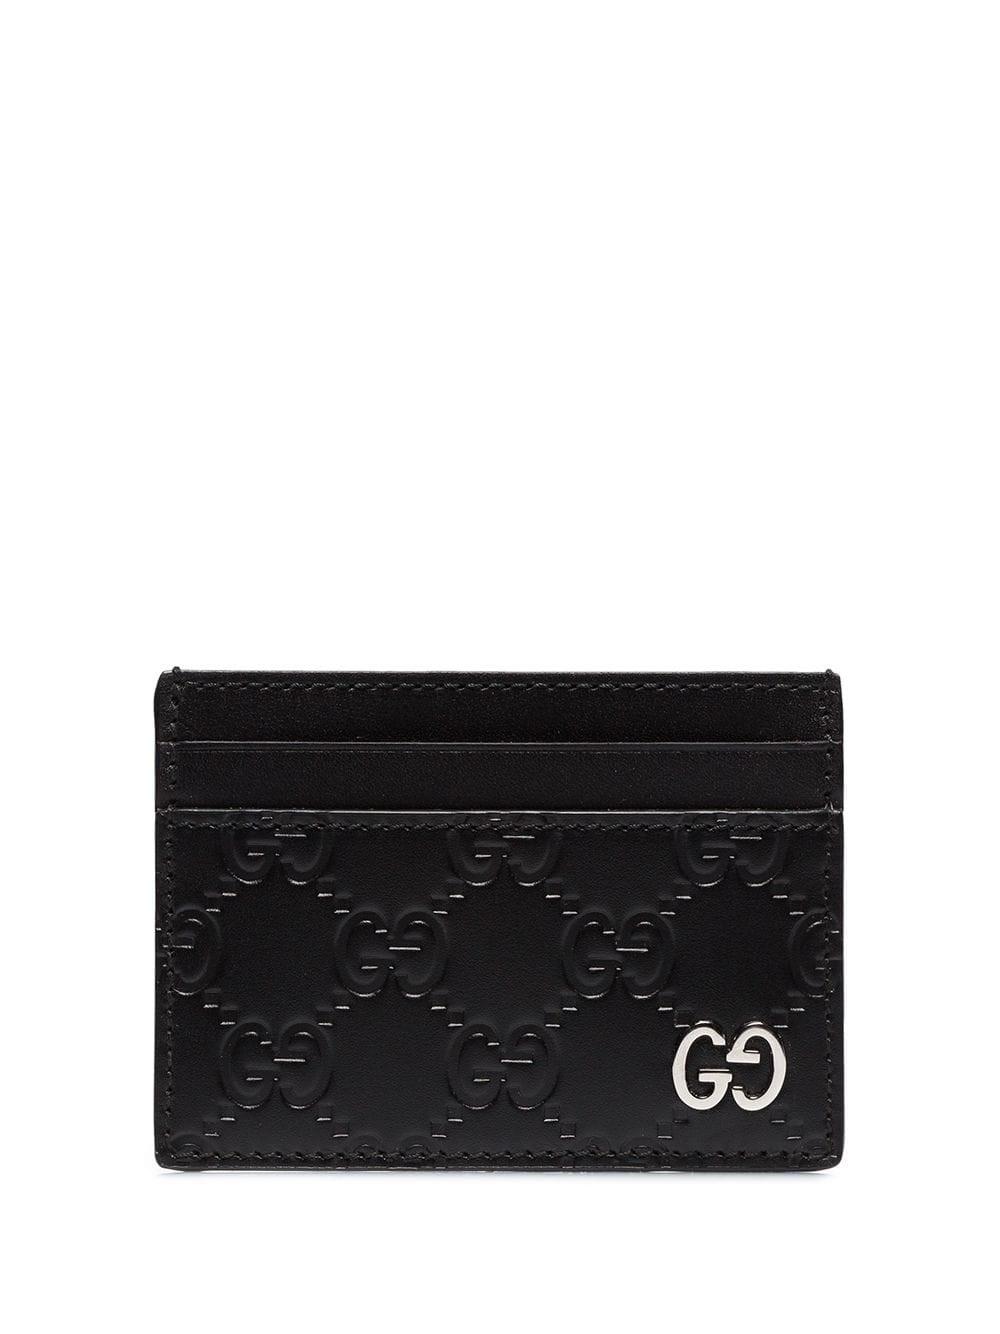 Gucci Card Holder In Black